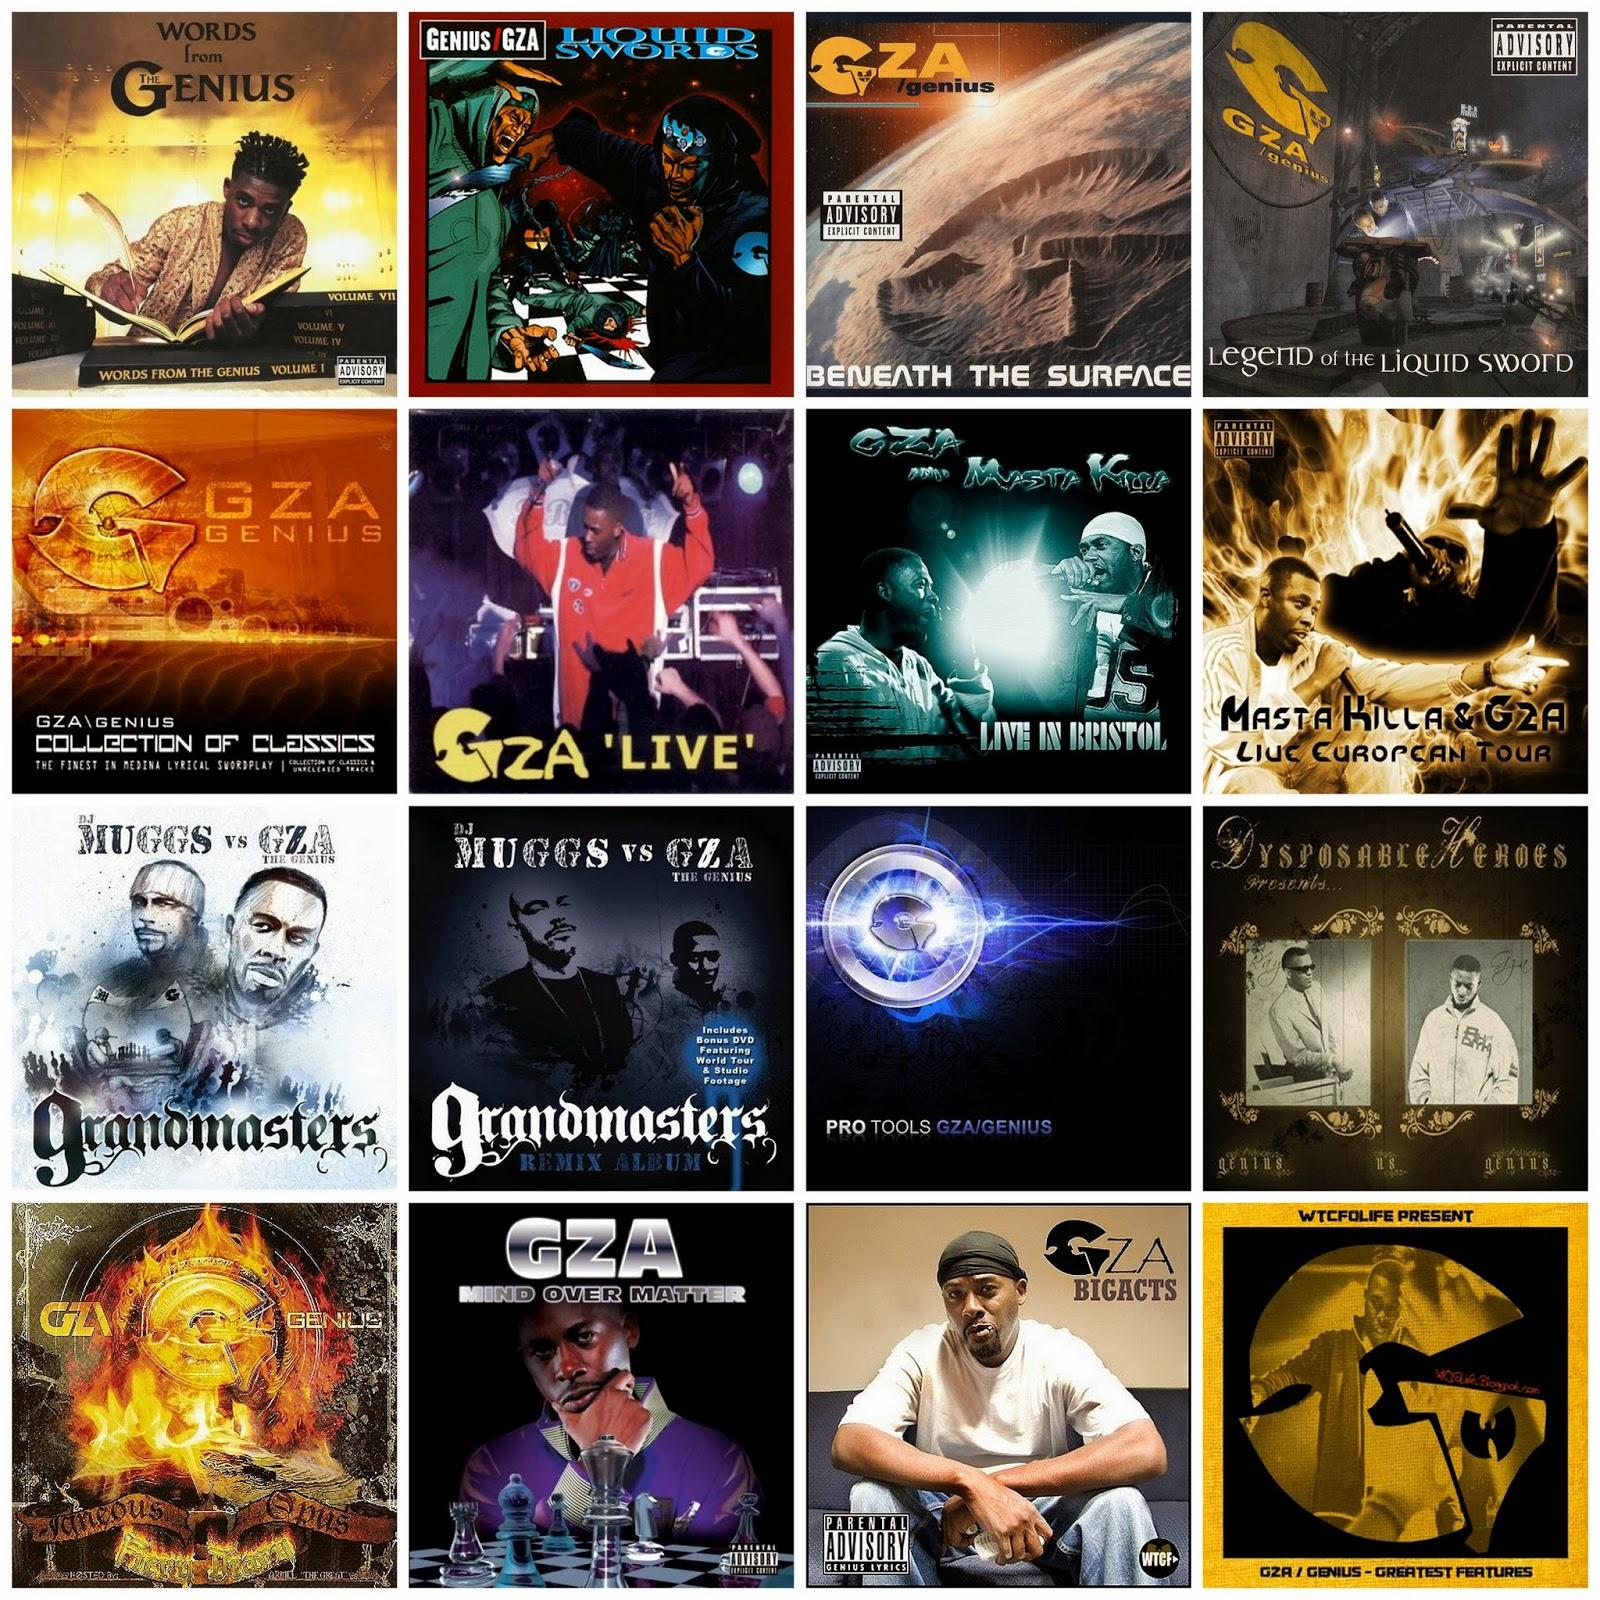 GZA | Discografía | Mediafire - Mega | 1991-2012 |  sc 1 st  Producto Ilícito - Blogger & GZA | Discografía | Mediafire - Mega | 1991-2012 | ~ Producto Ilícito